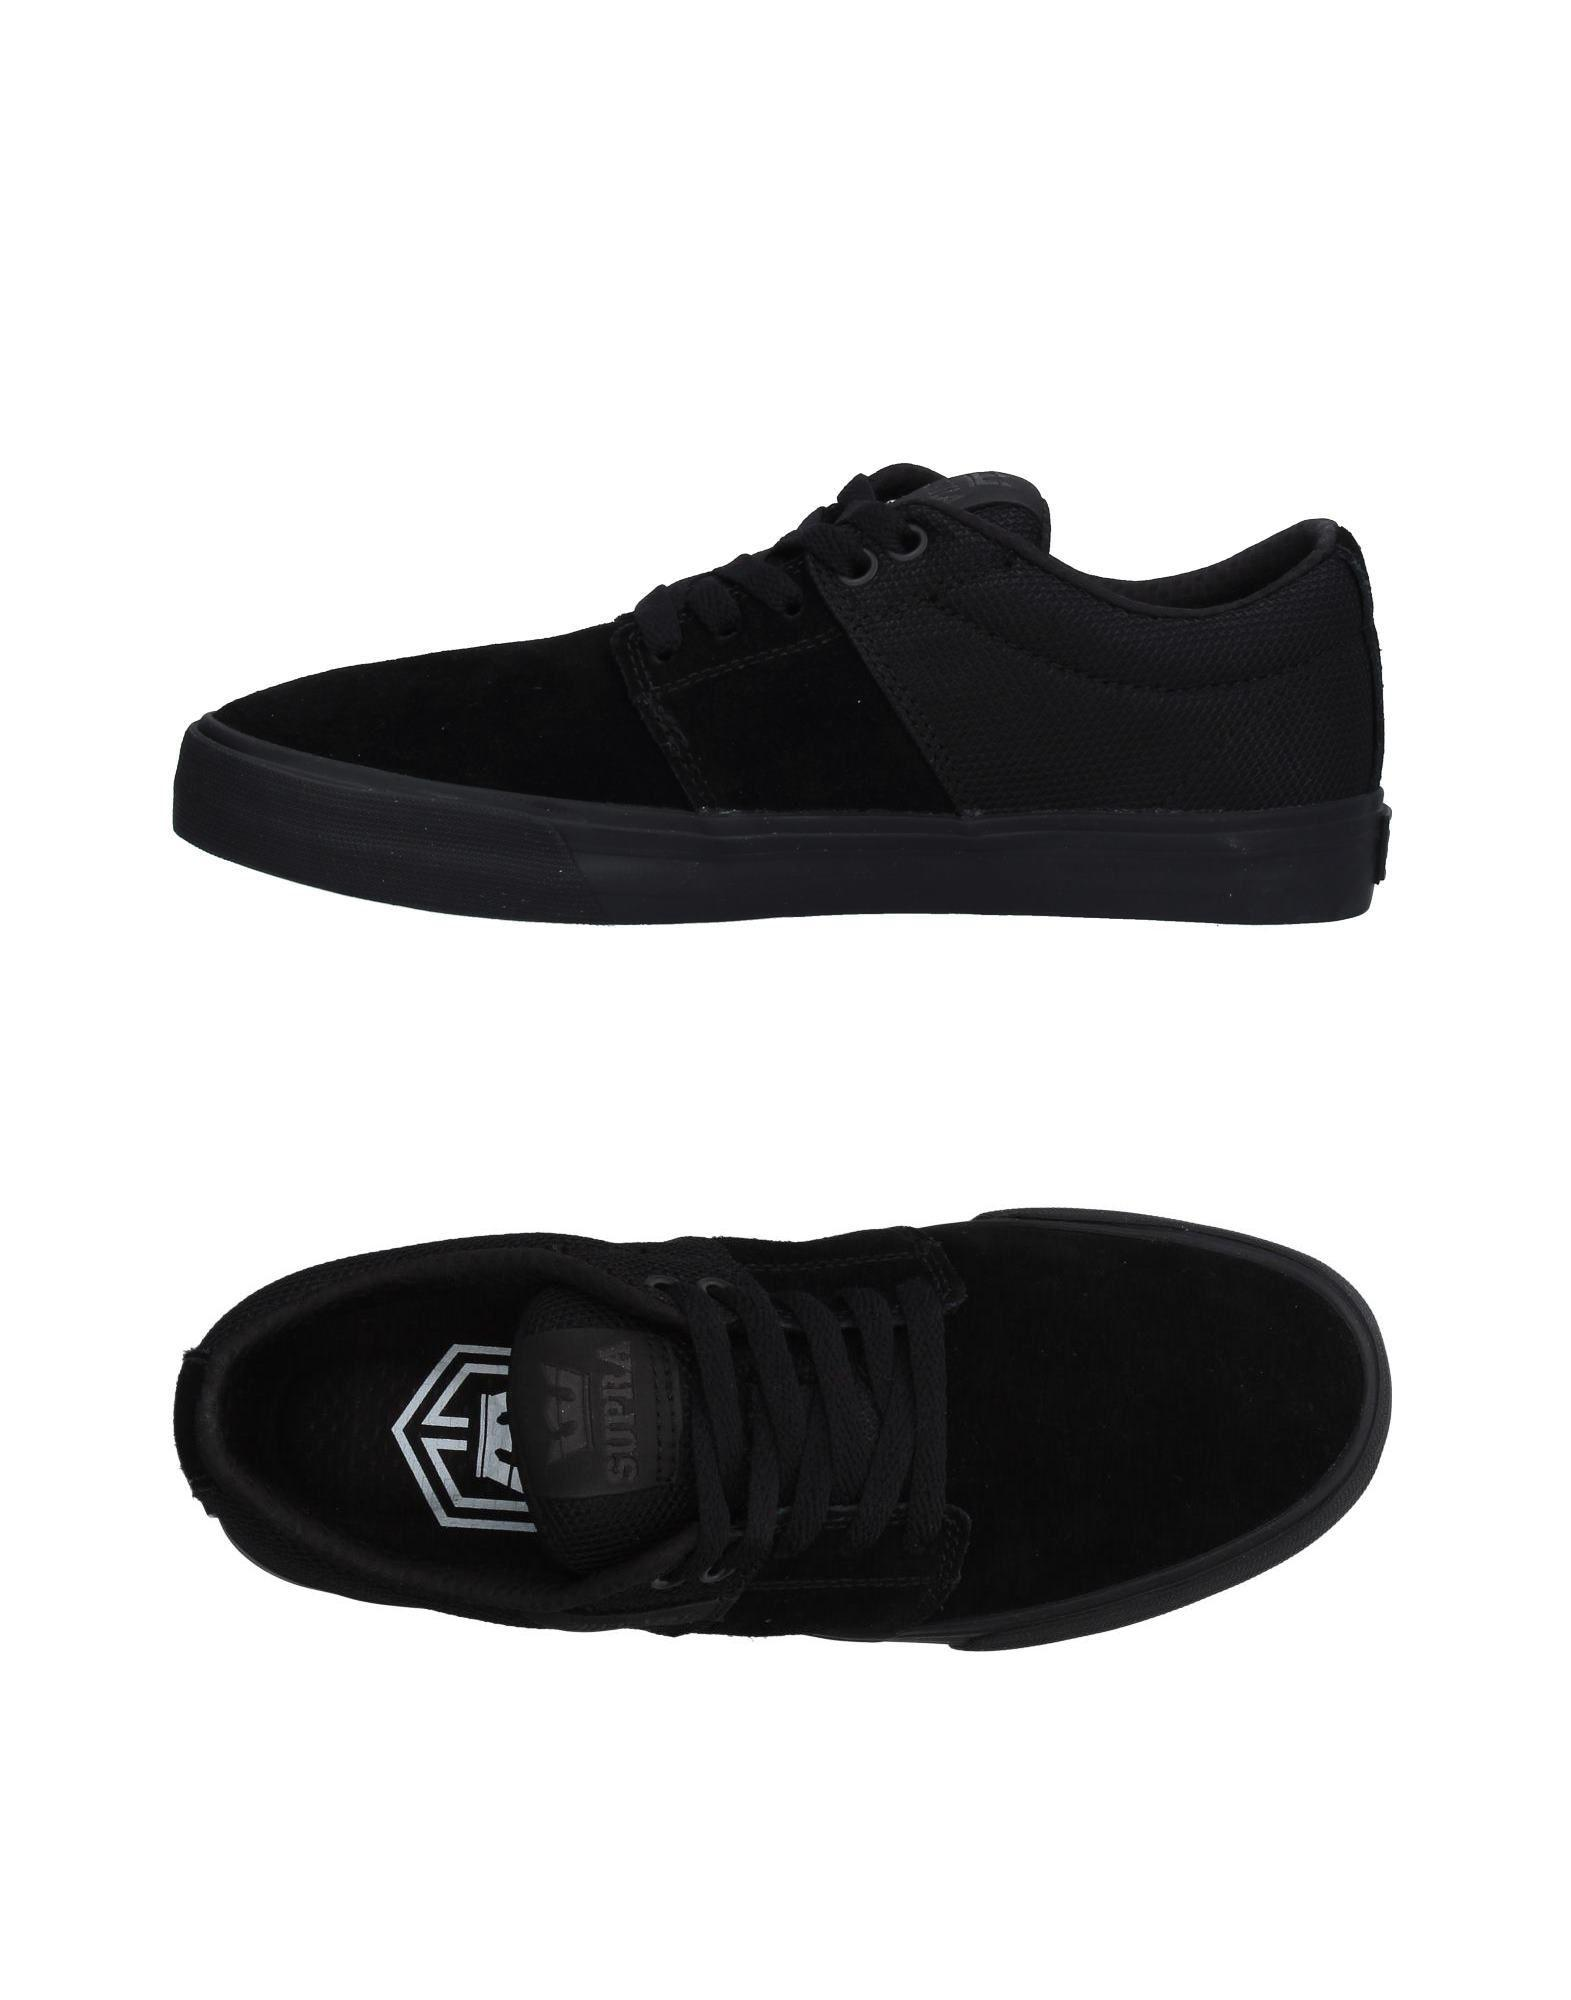 6fdc6773ed Lyst - Supra Low-tops & Sneakers in Black for Men